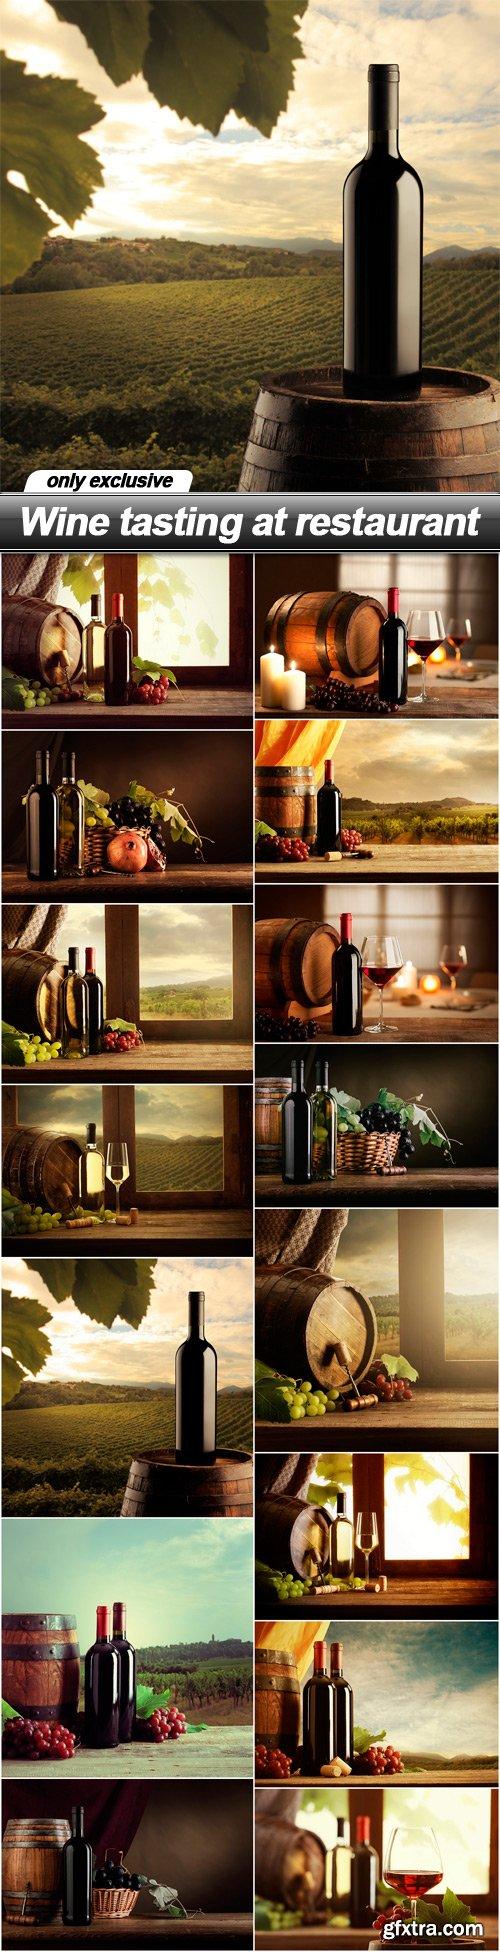 Wine tasting at restaurant - 15 UHQ JPEG